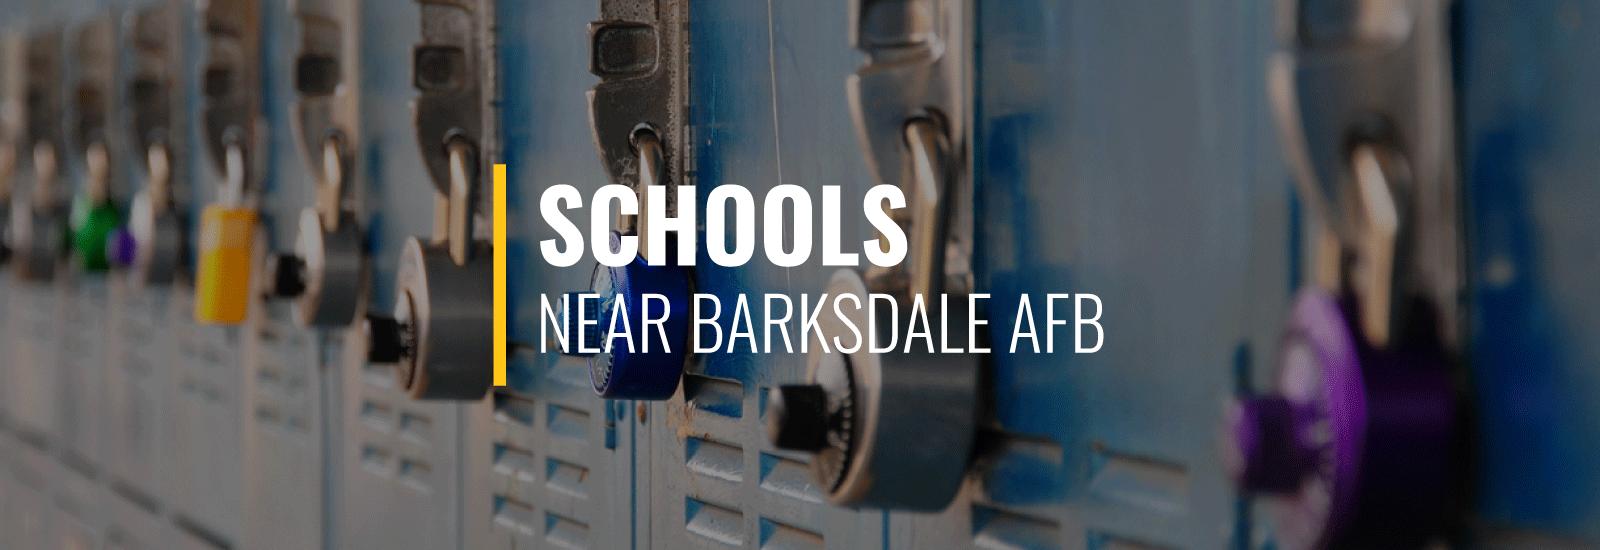 Barksdale AFB Schools